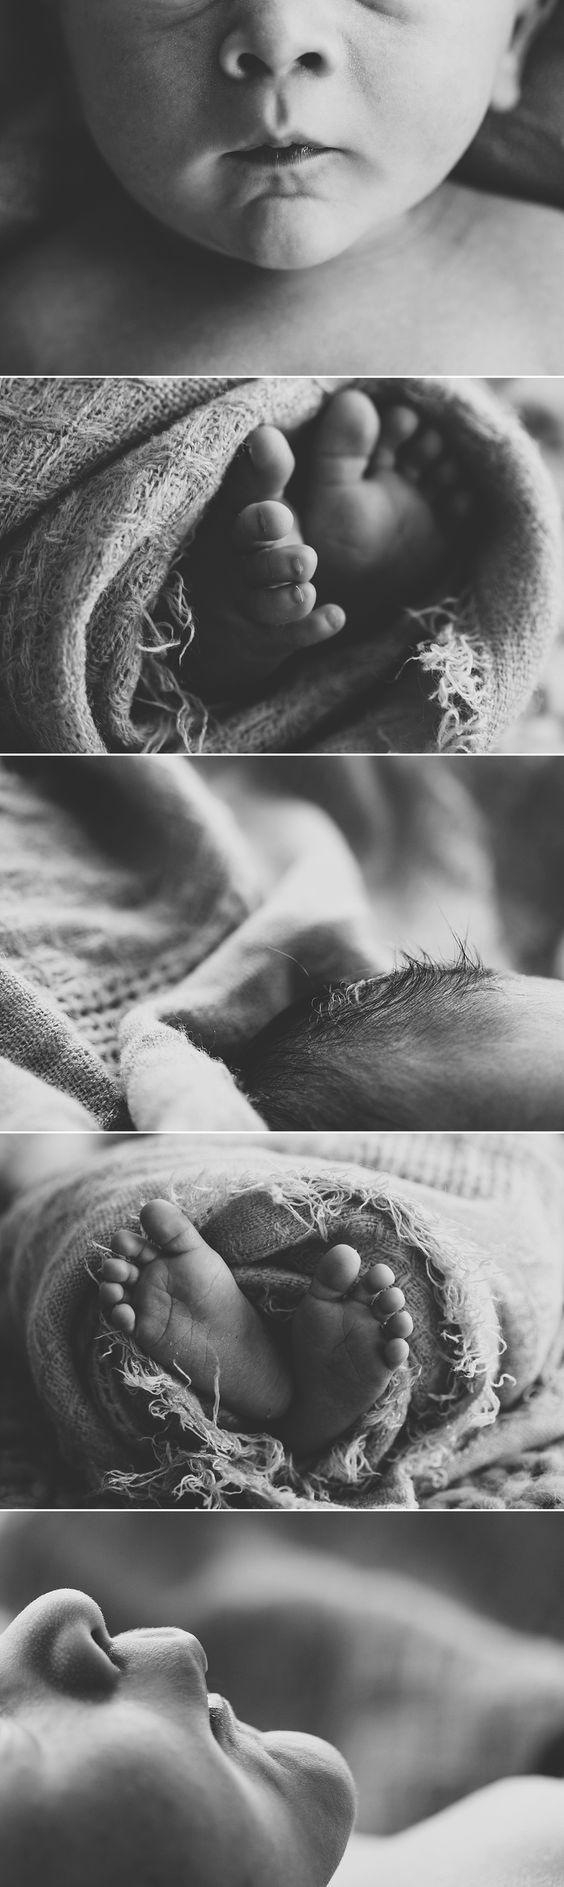 newborn photography, macro shots Baby photography ideas